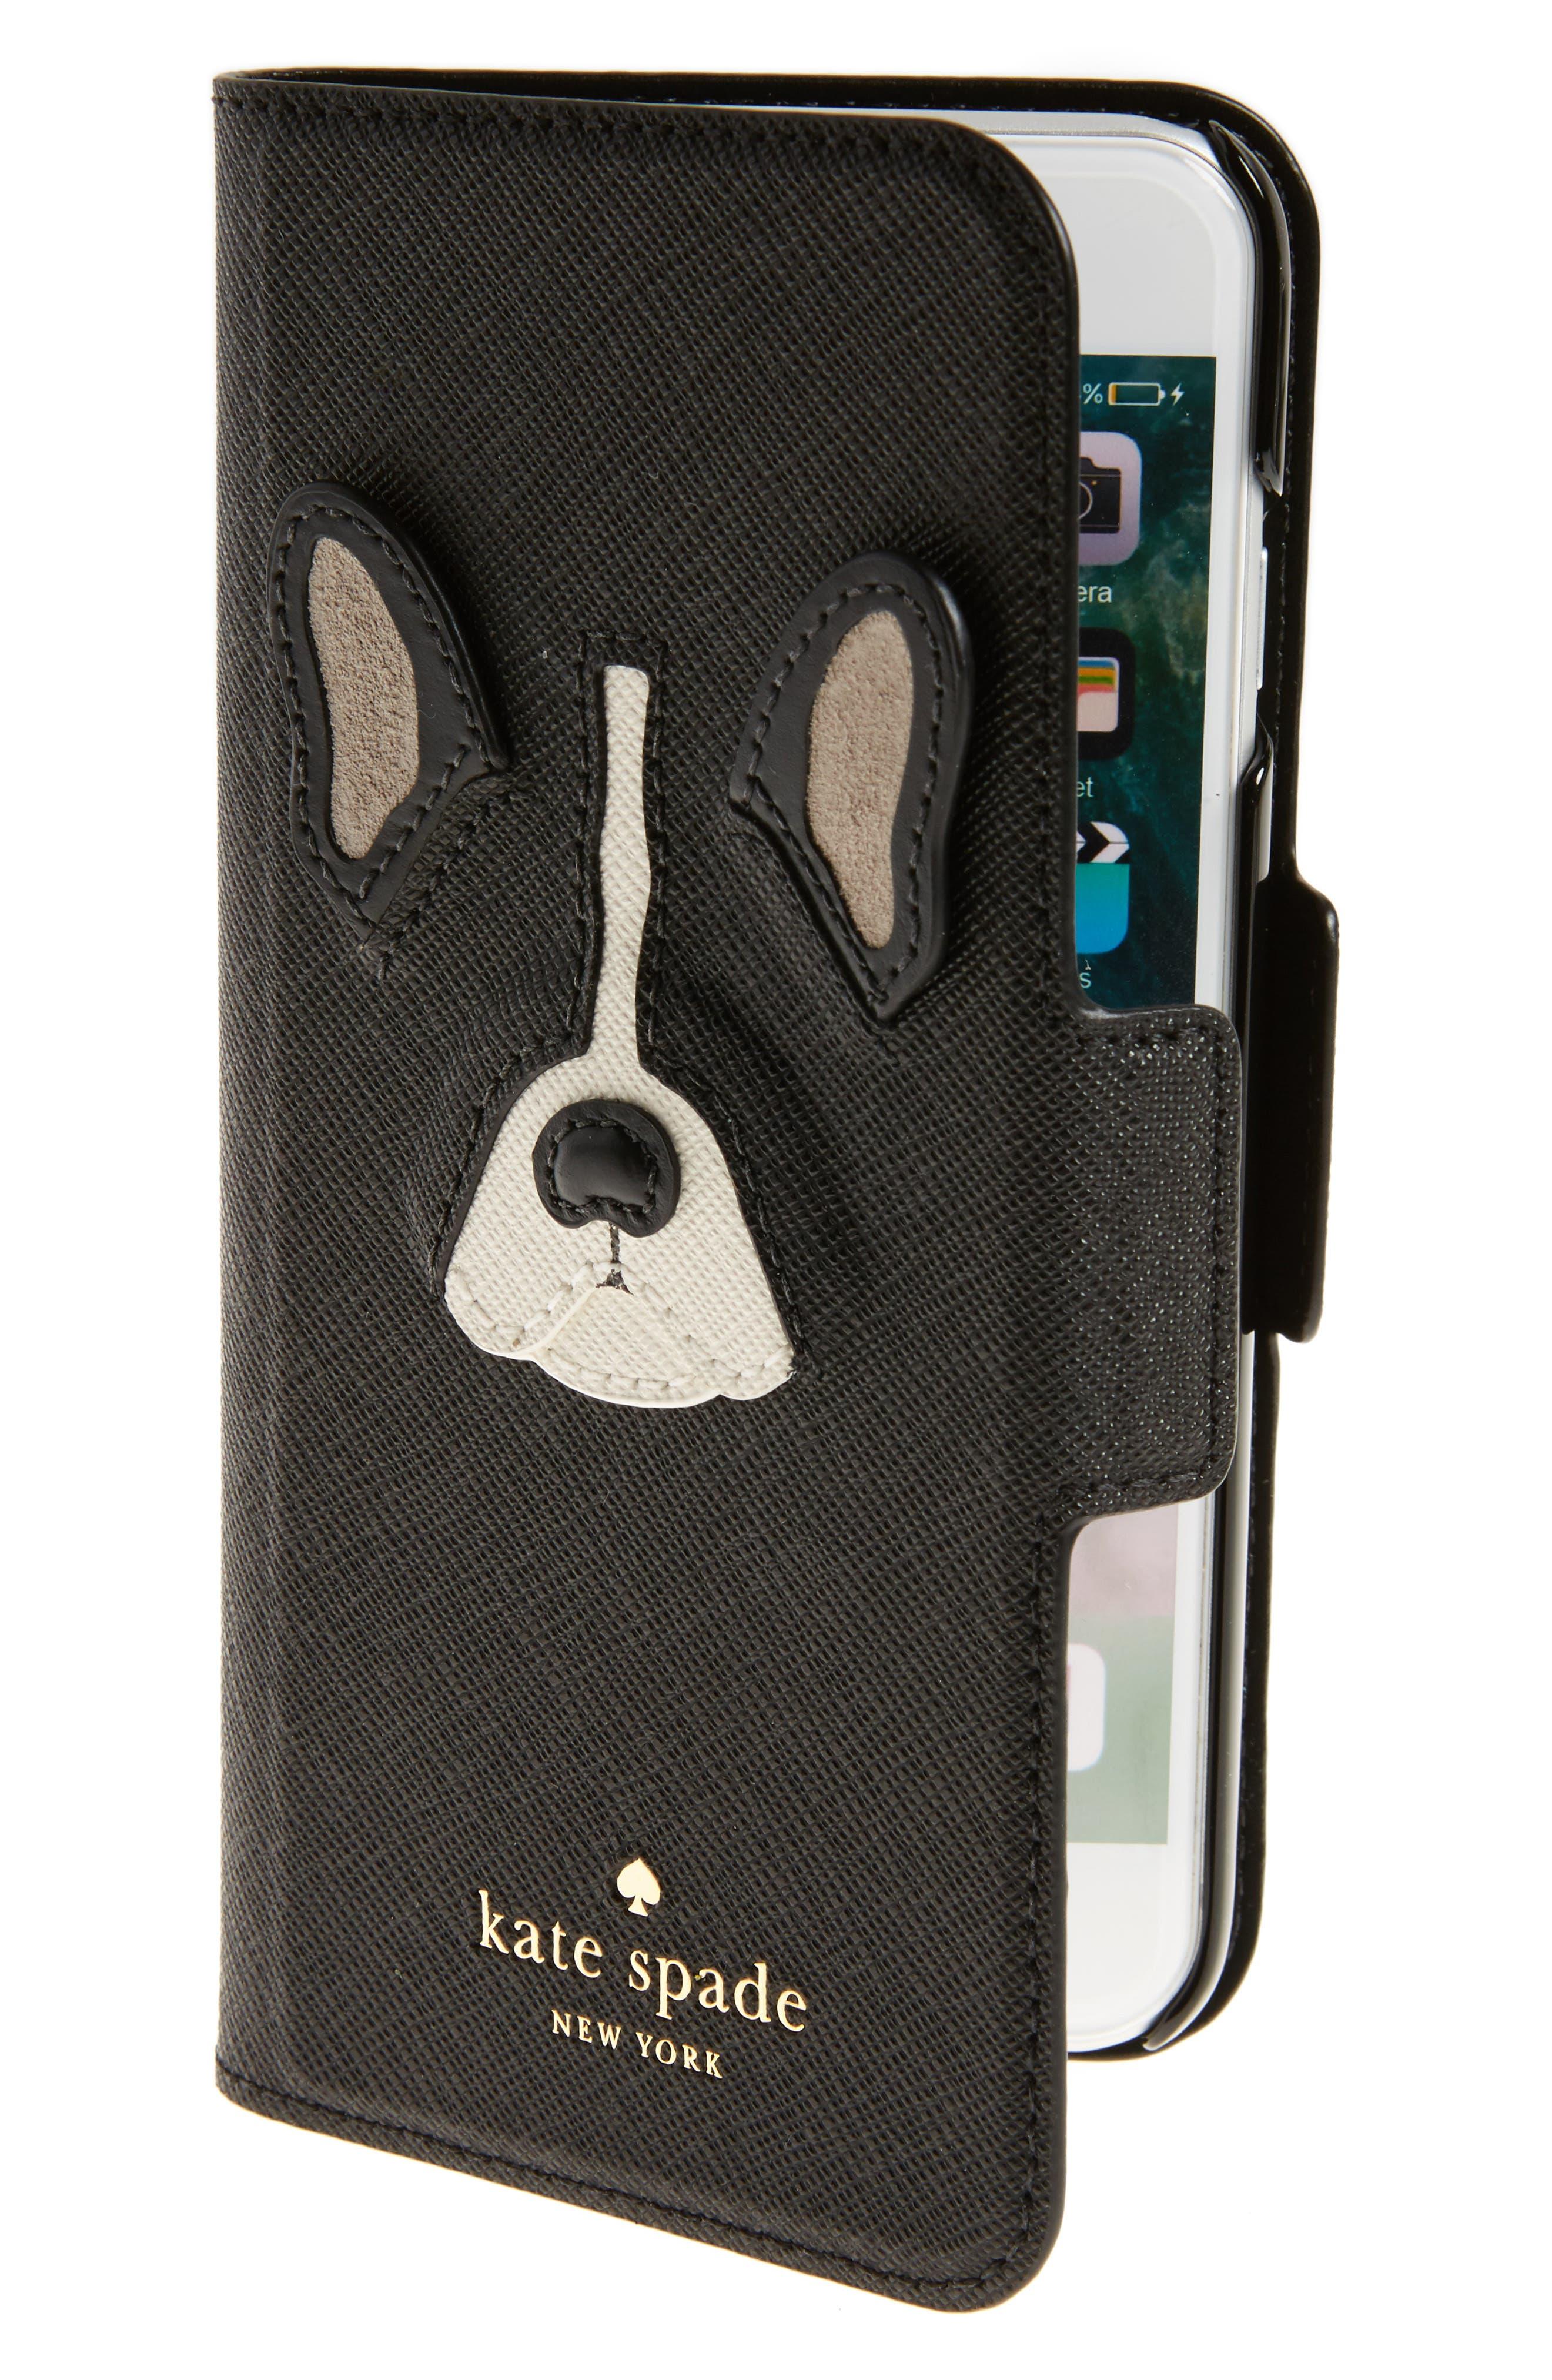 KATE SPADE NEW YORK antoine appliqué leather iPhone 7 folio case